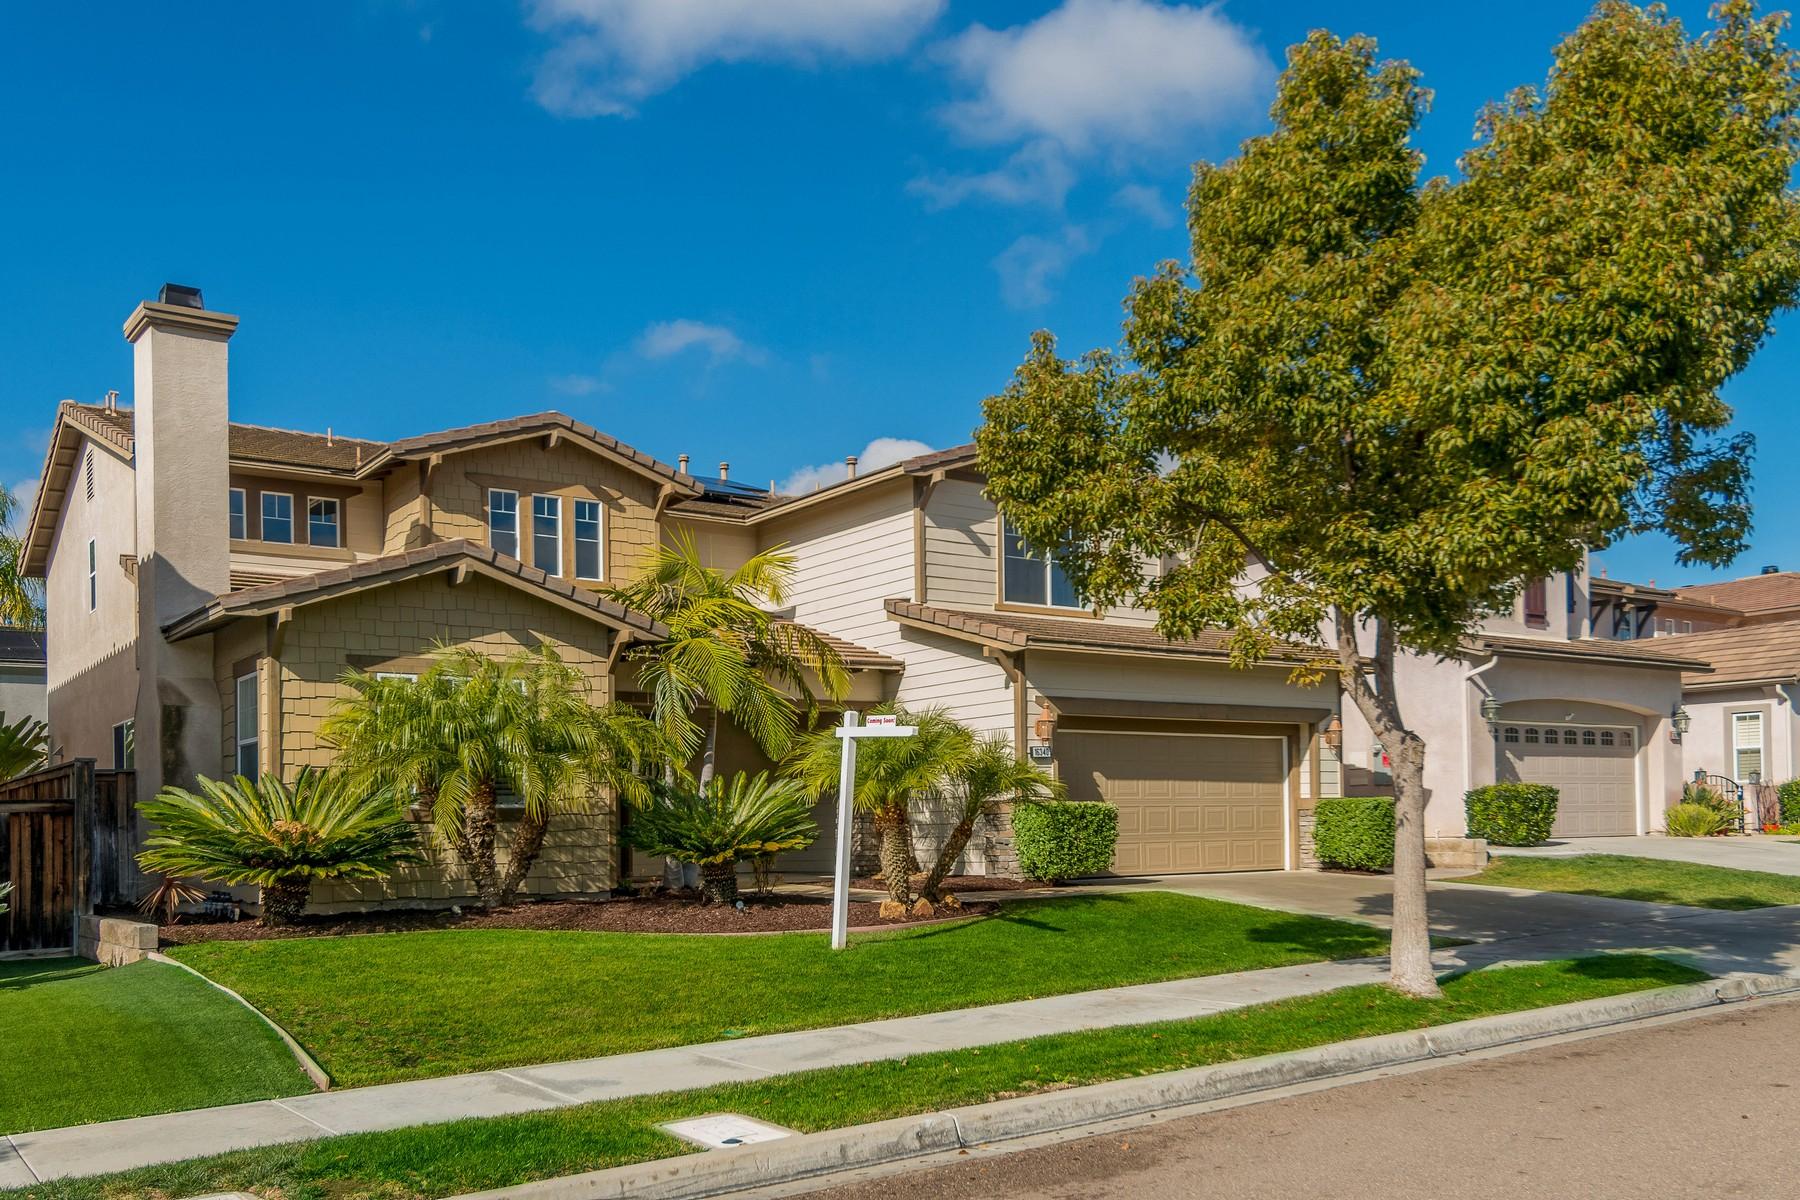 Casa Unifamiliar por un Venta en 16340 Pinto Ridge Court San Diego, California, 92127 Estados Unidos